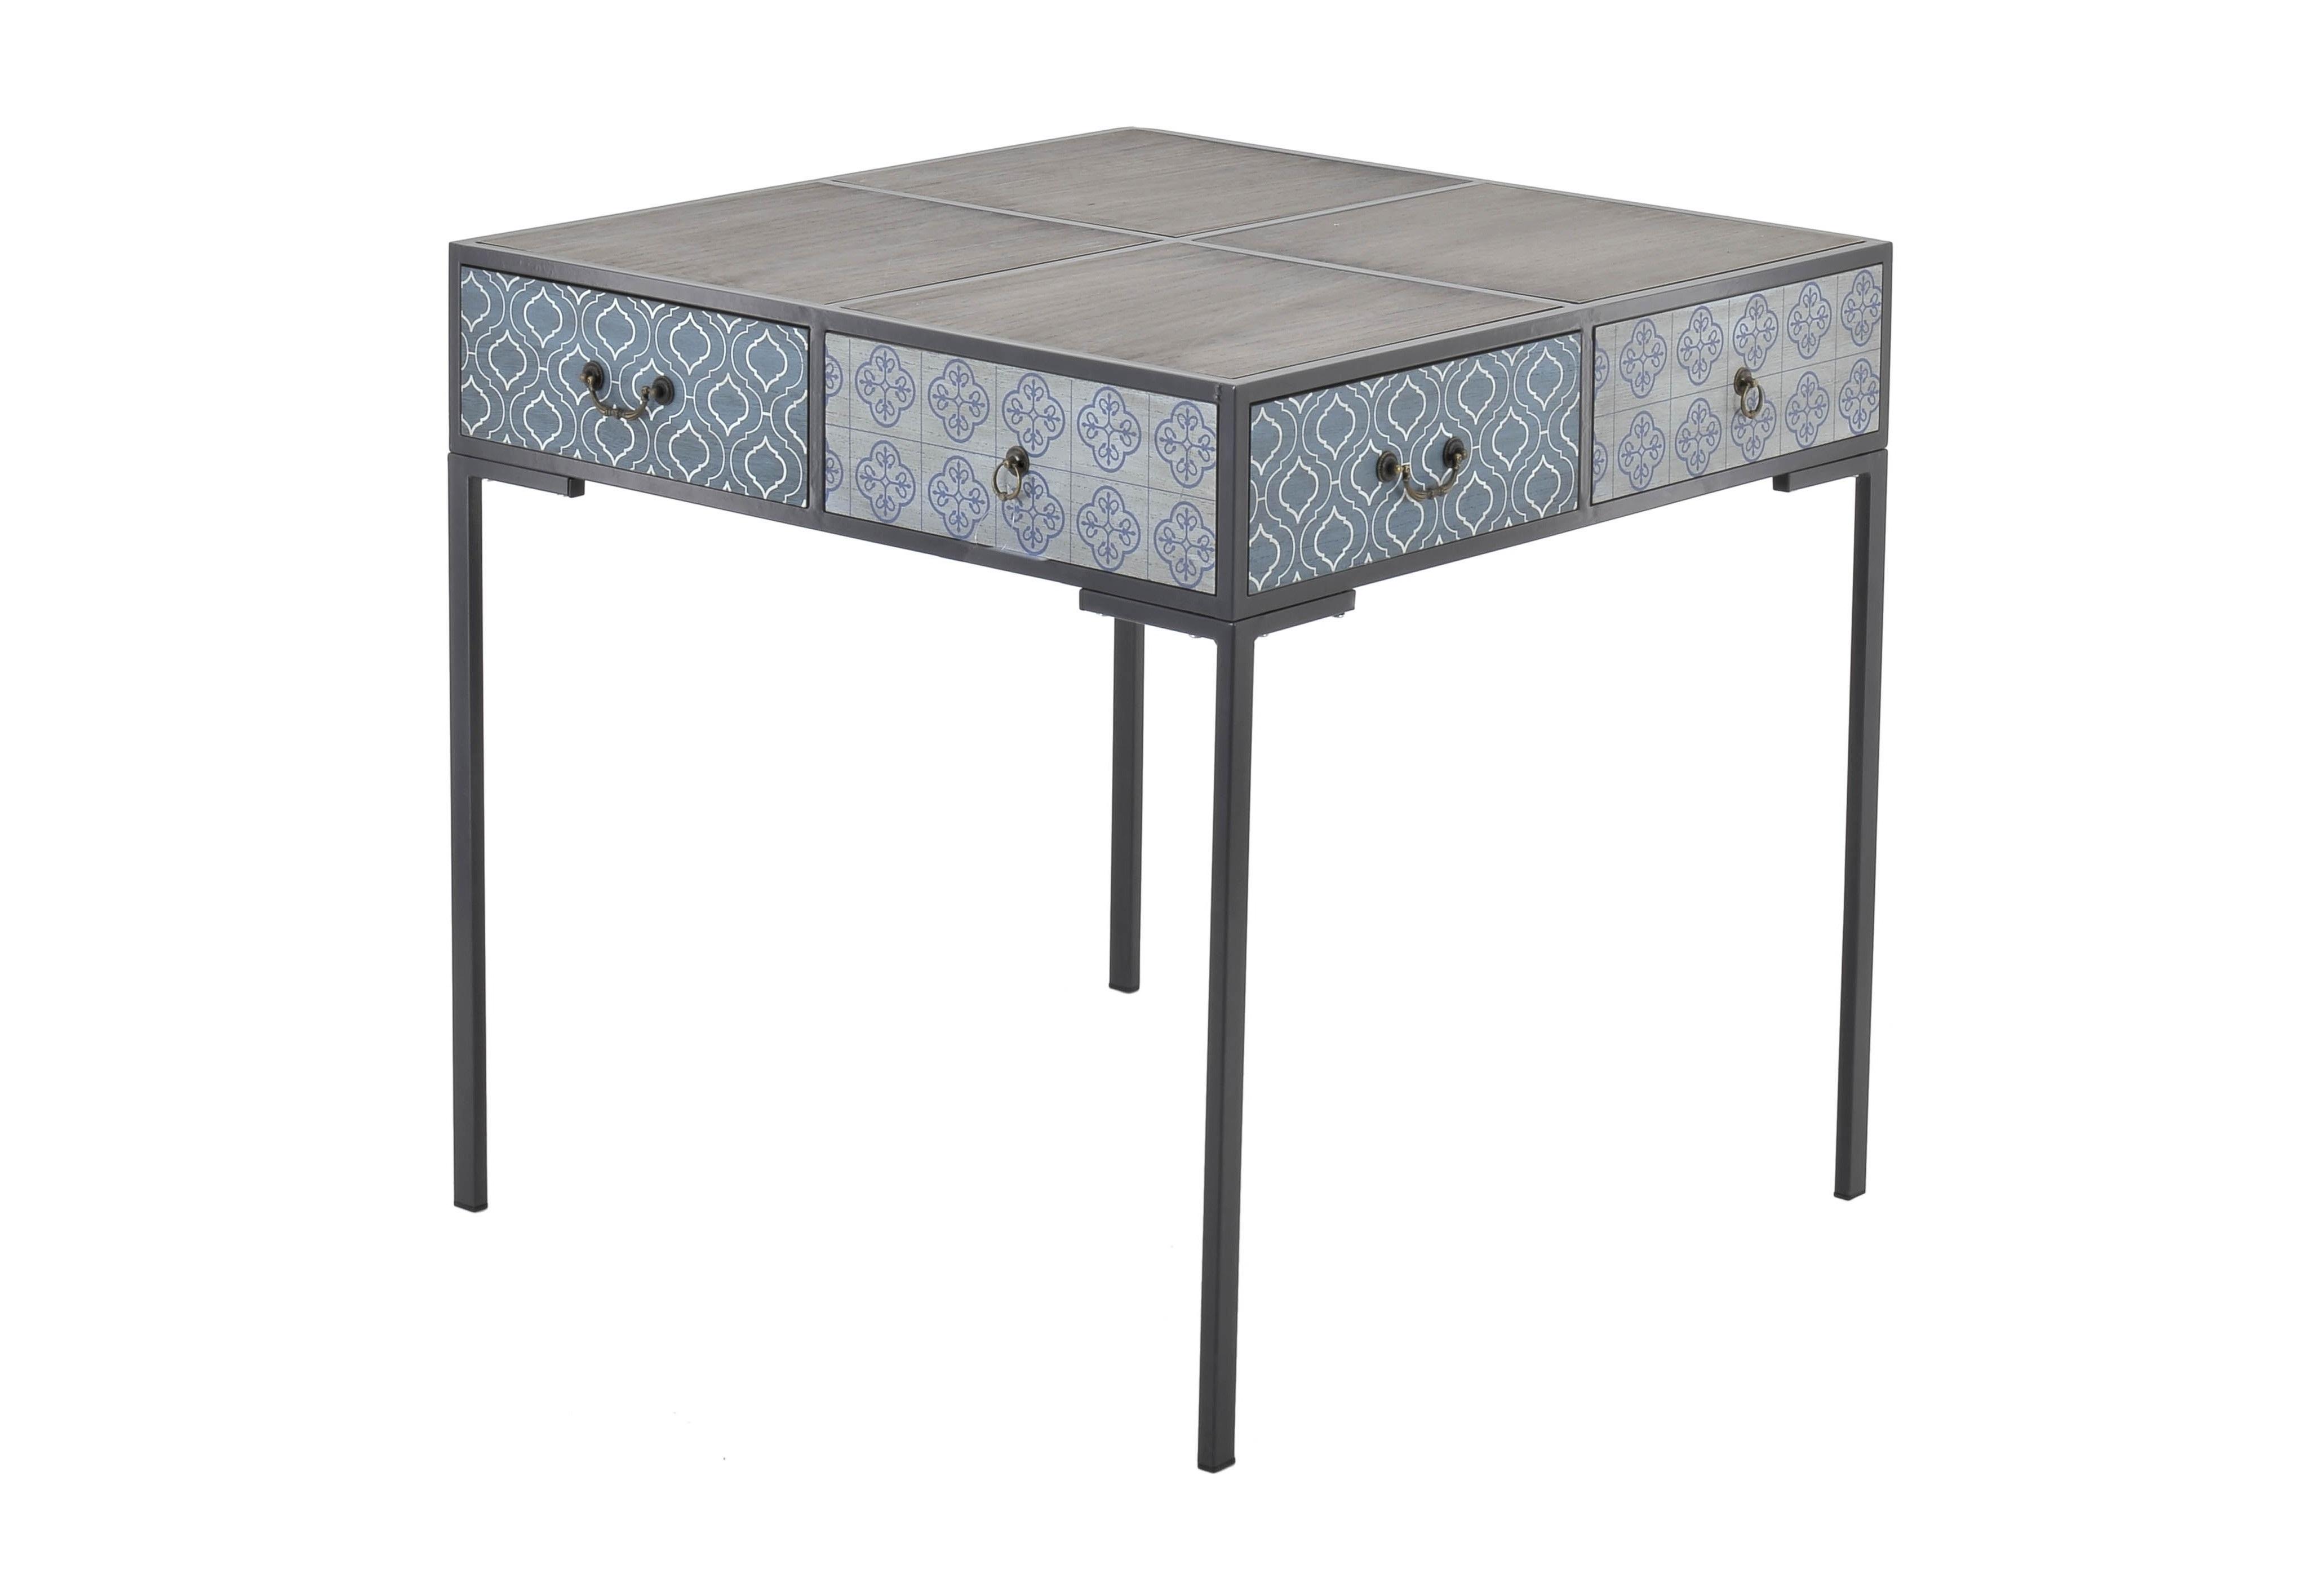 Стол BluerОбеденные столы<br>Материал: металл, адамово дерево.<br><br>Material: Дерево<br>Length см: None<br>Width см: 80<br>Depth см: 80<br>Height см: 76